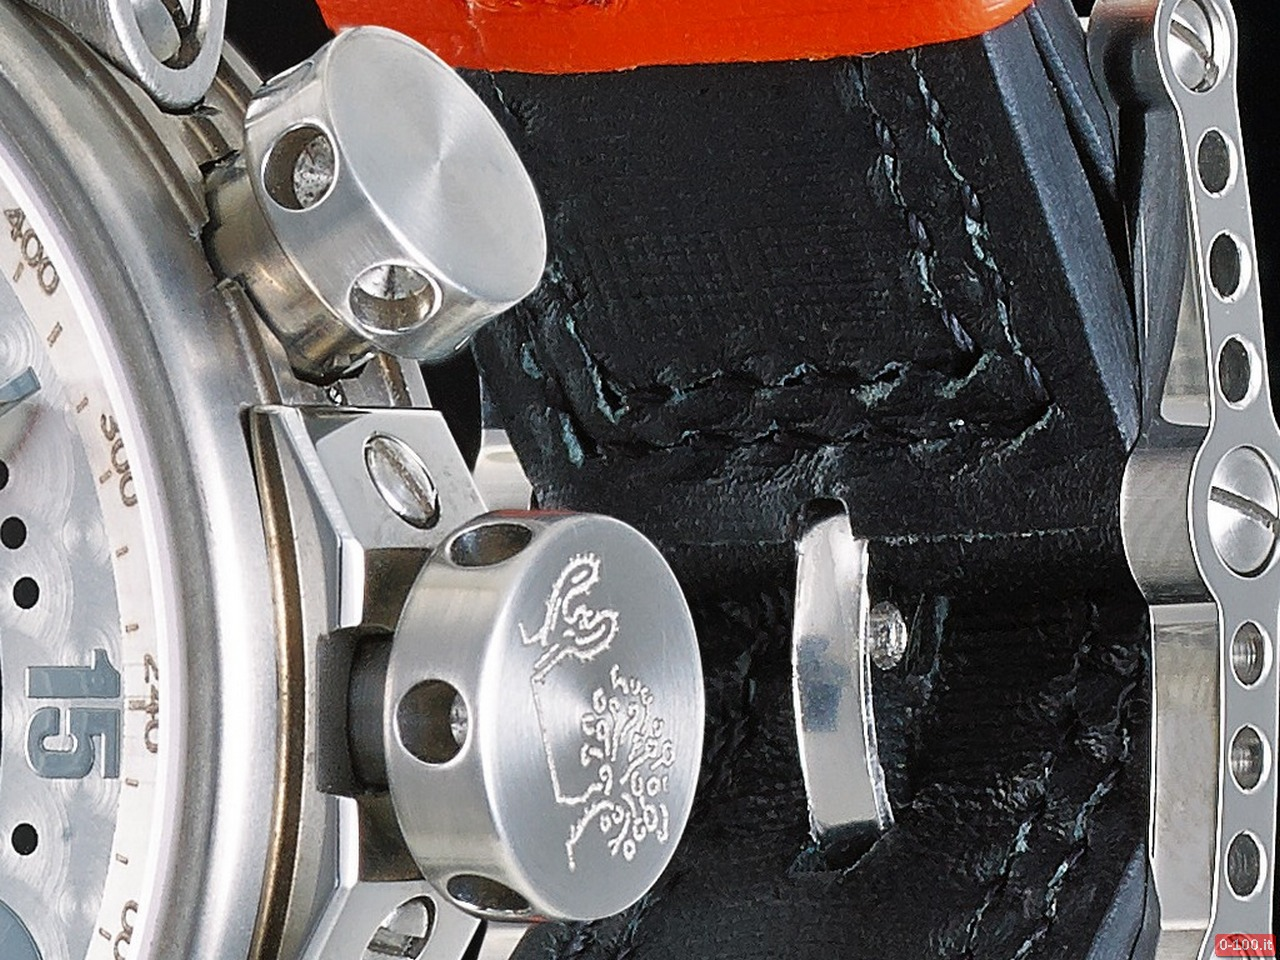 brm-v12-44-rallye-maroc-classic-prezzo-price-0-100_3